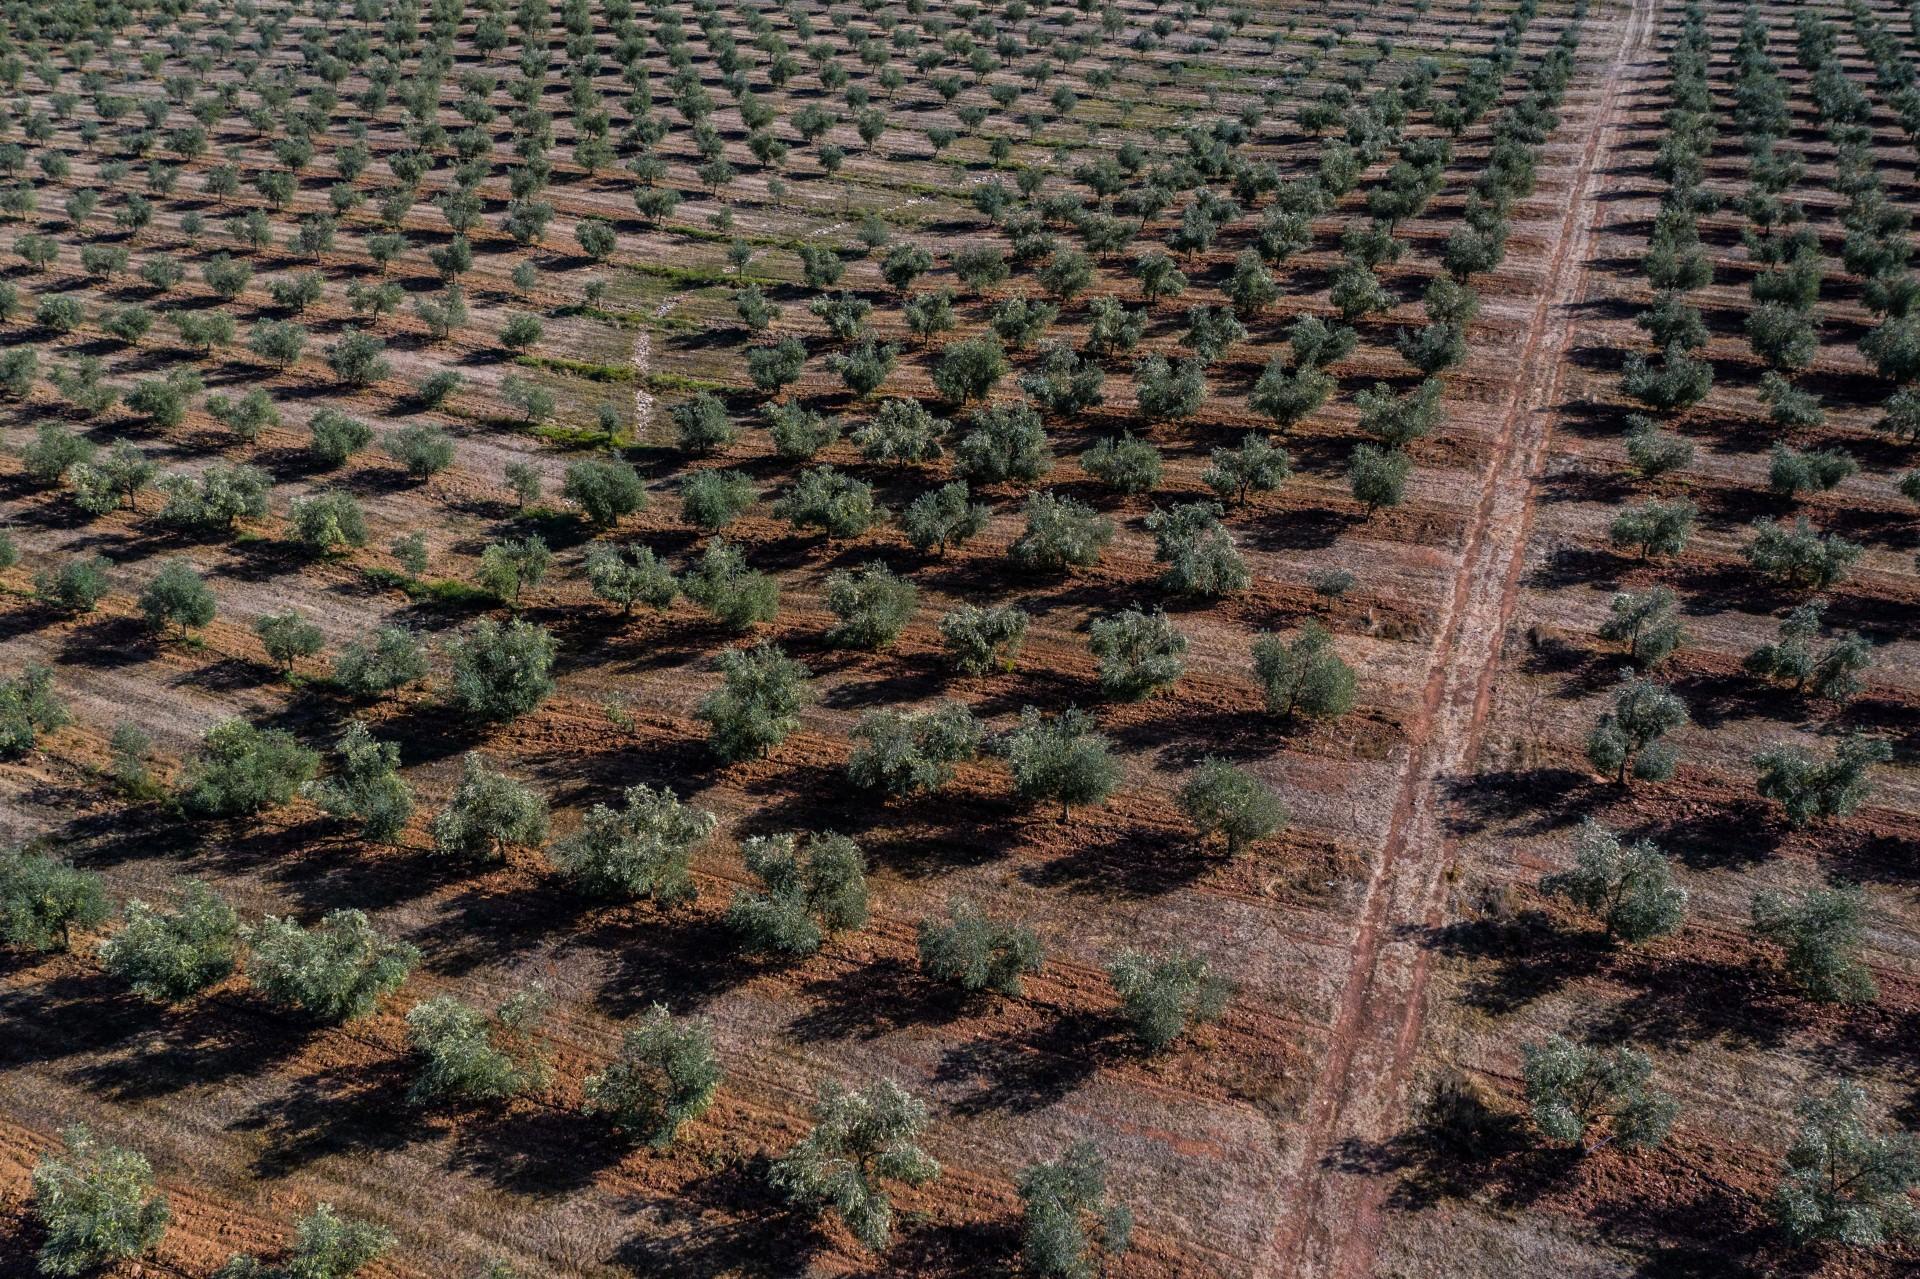 Olijfbomen Alentejo Portugal &Olives Travel olijfbomen planten